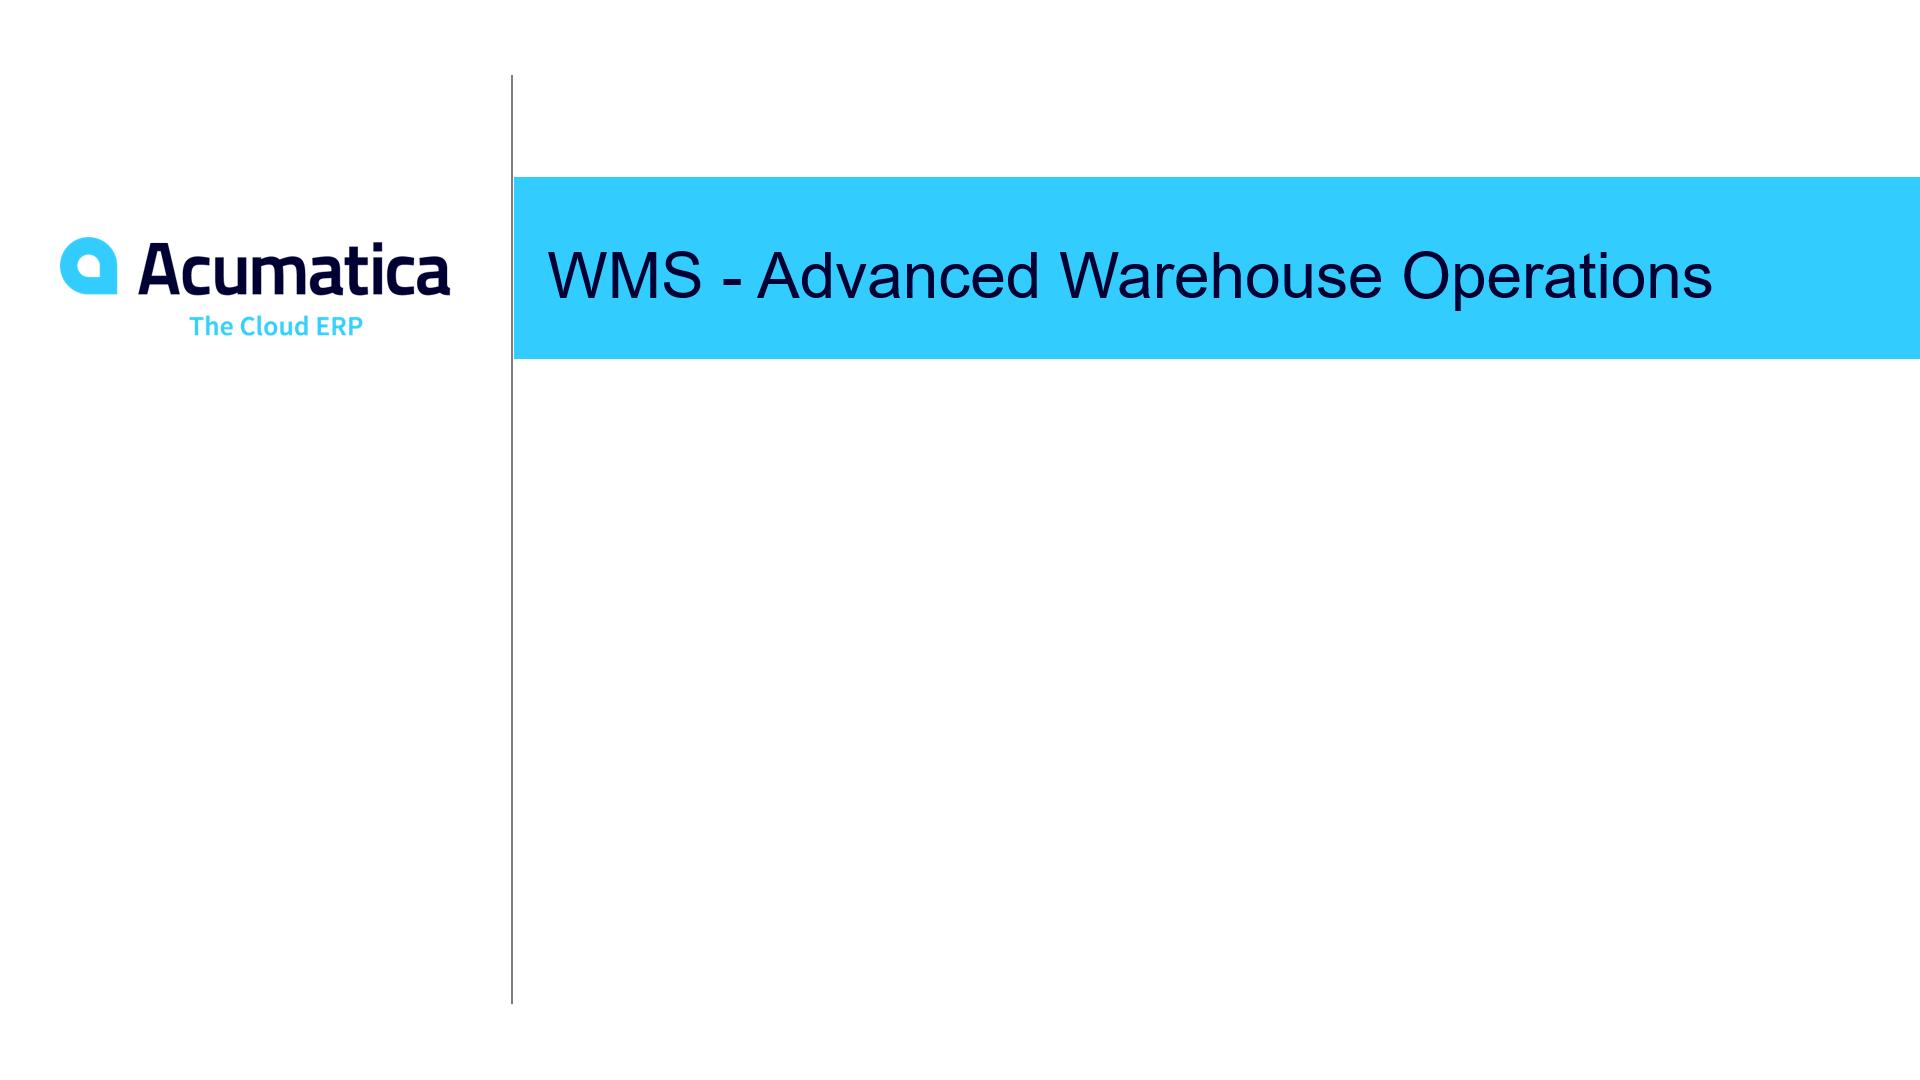 WMS - Advanced Warehouse Operations